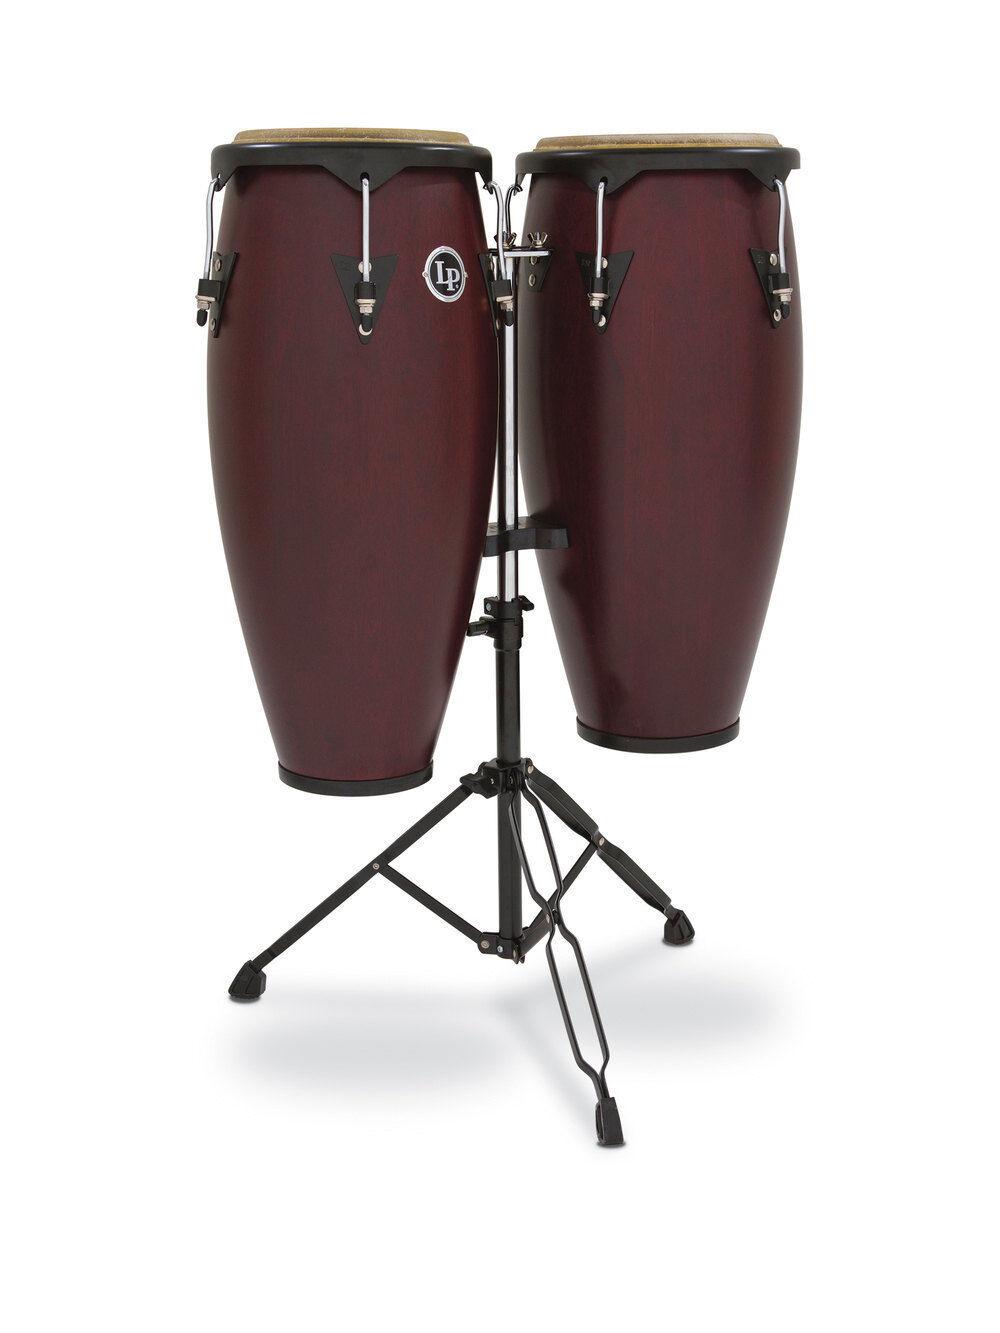 Latin Percussion Congaset City Series Dark Wood Latin Percussion